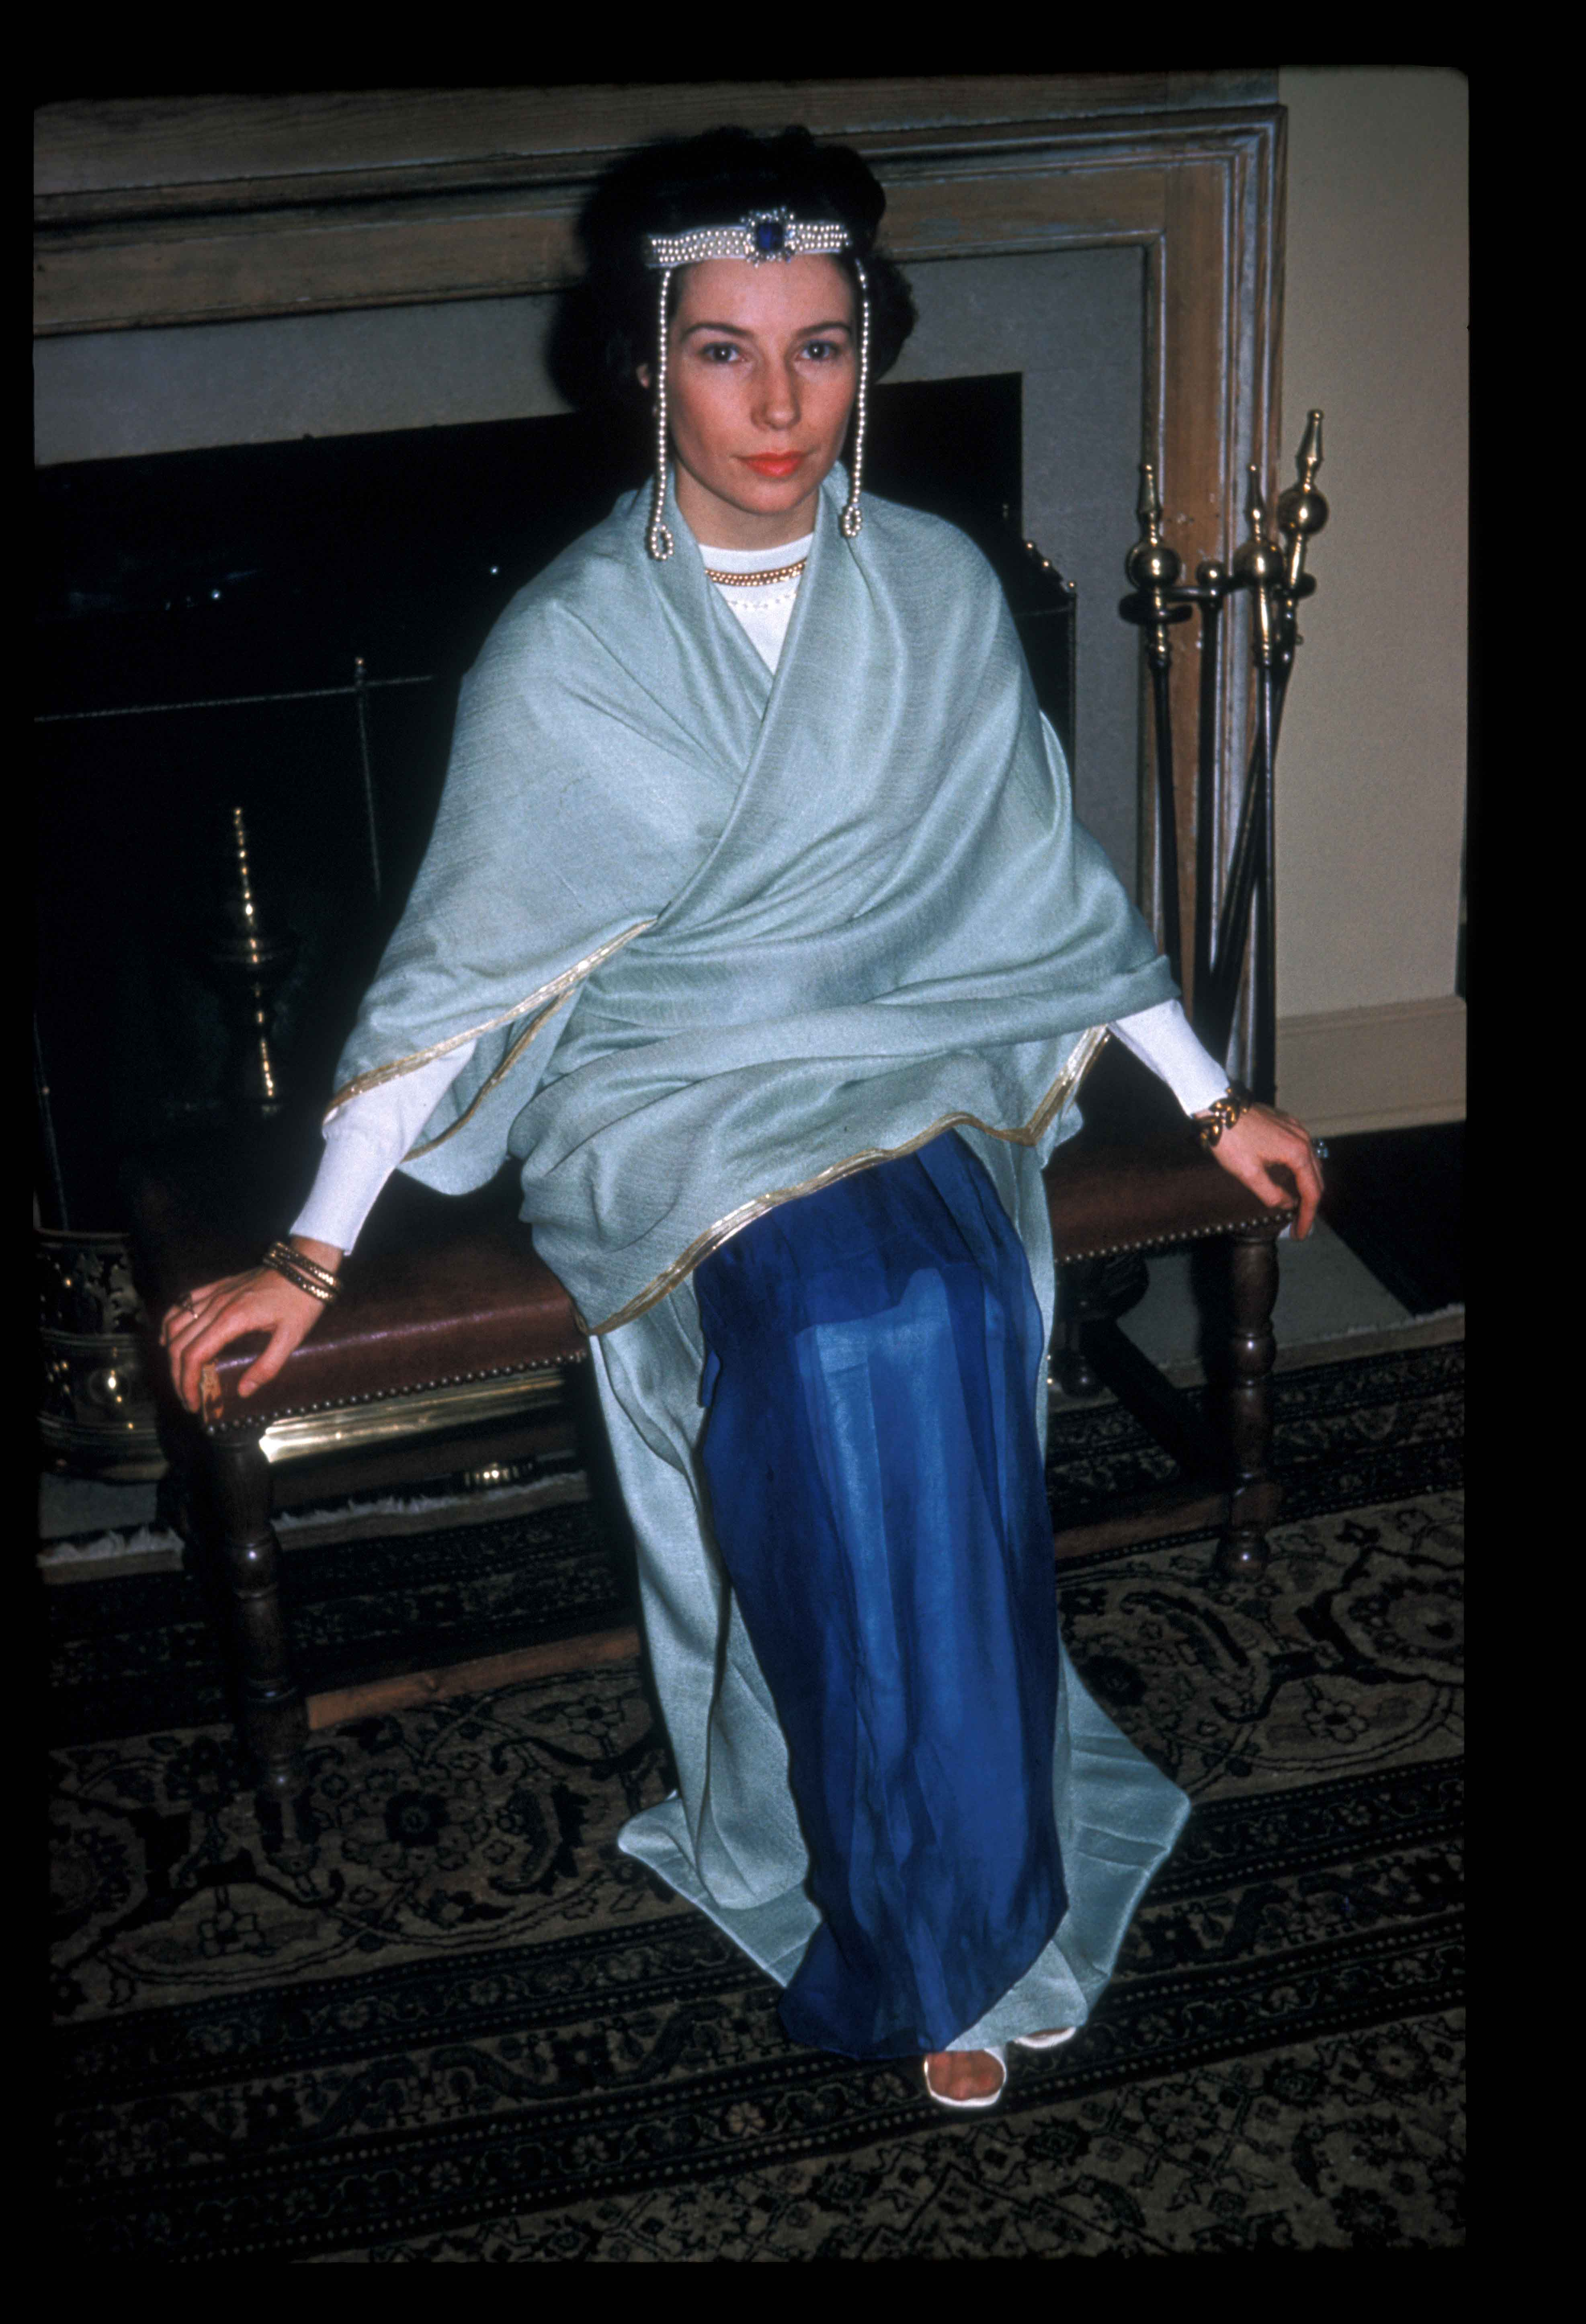 Jacqueline Lafontaine as Anicia Juliana. Dumbarton Oaks Archives, AR.PH.Misc.227.